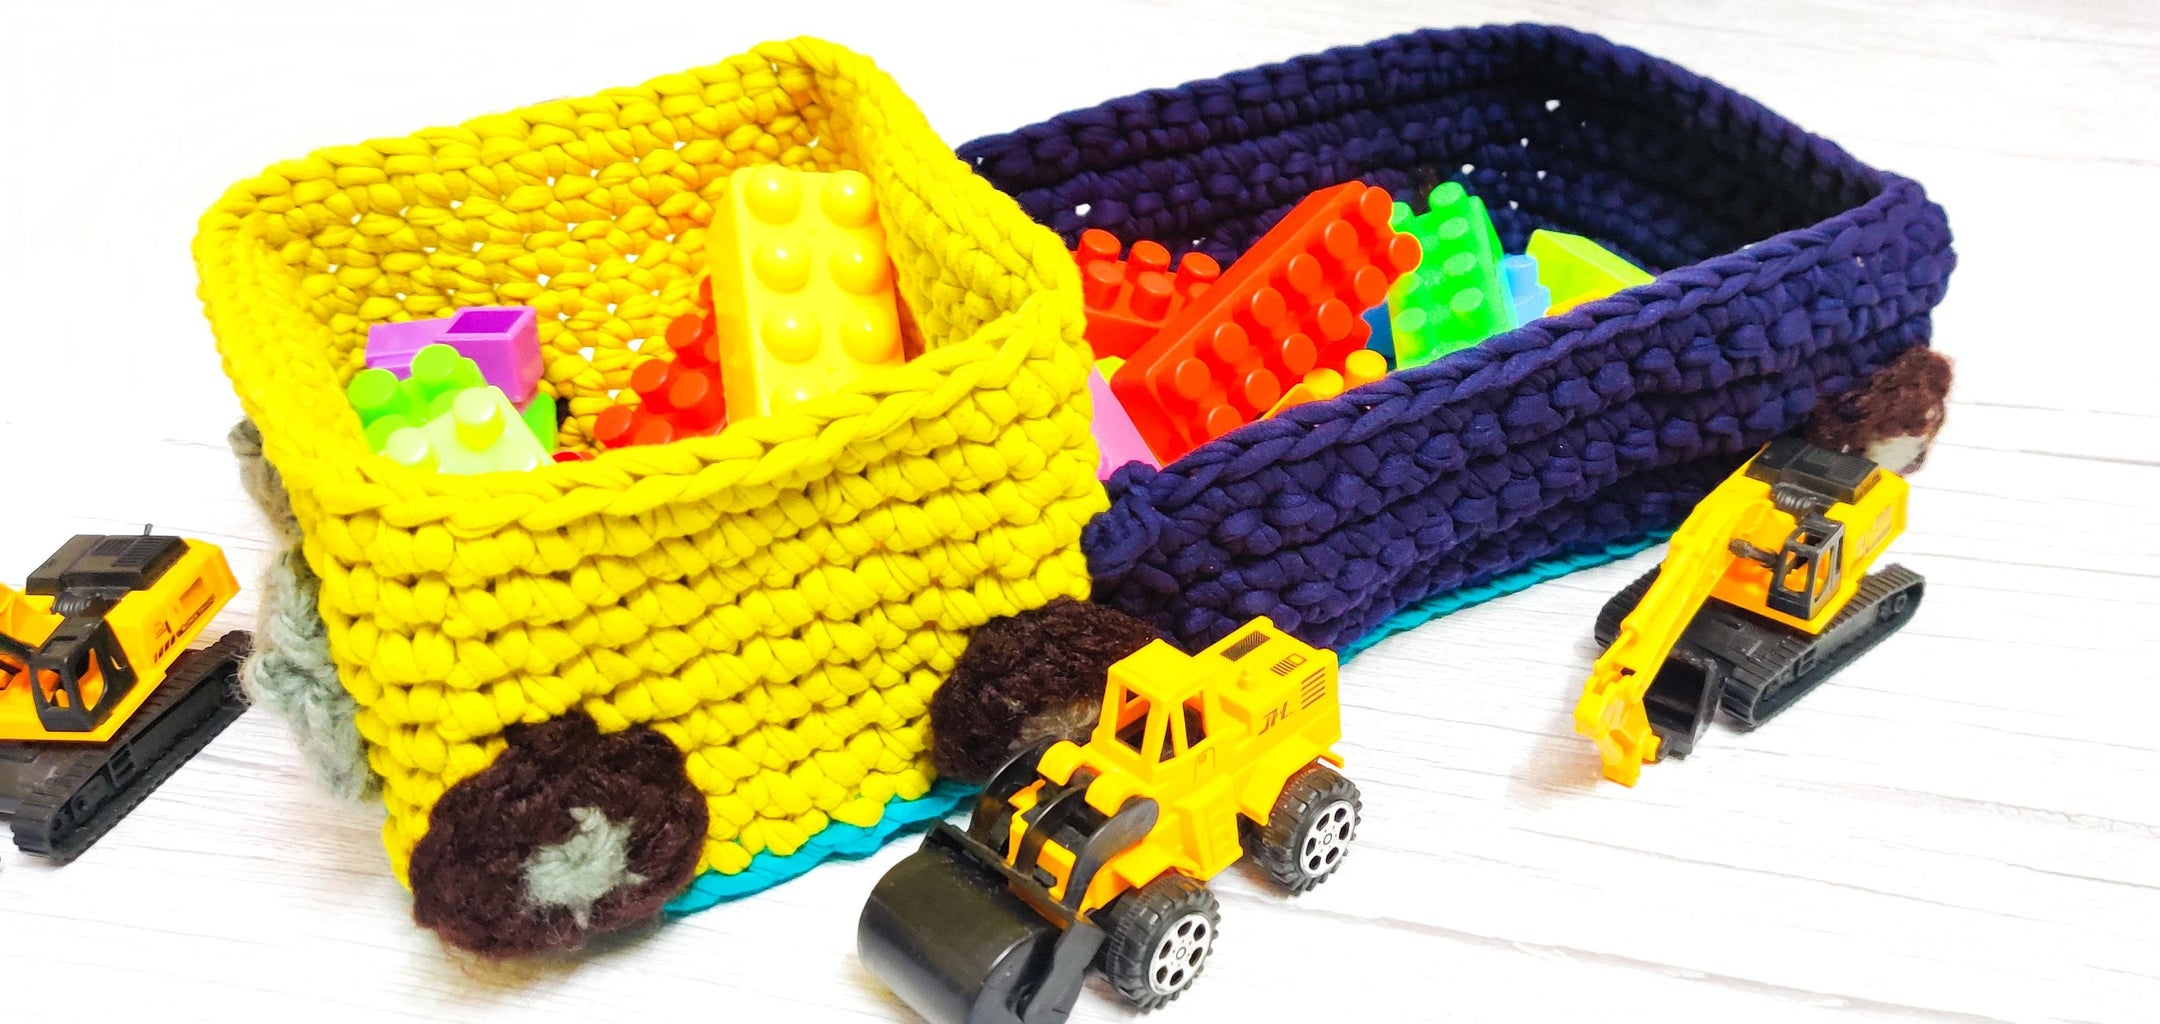 Toy Truck Crochet Storage Basket With T-shirt Yarn